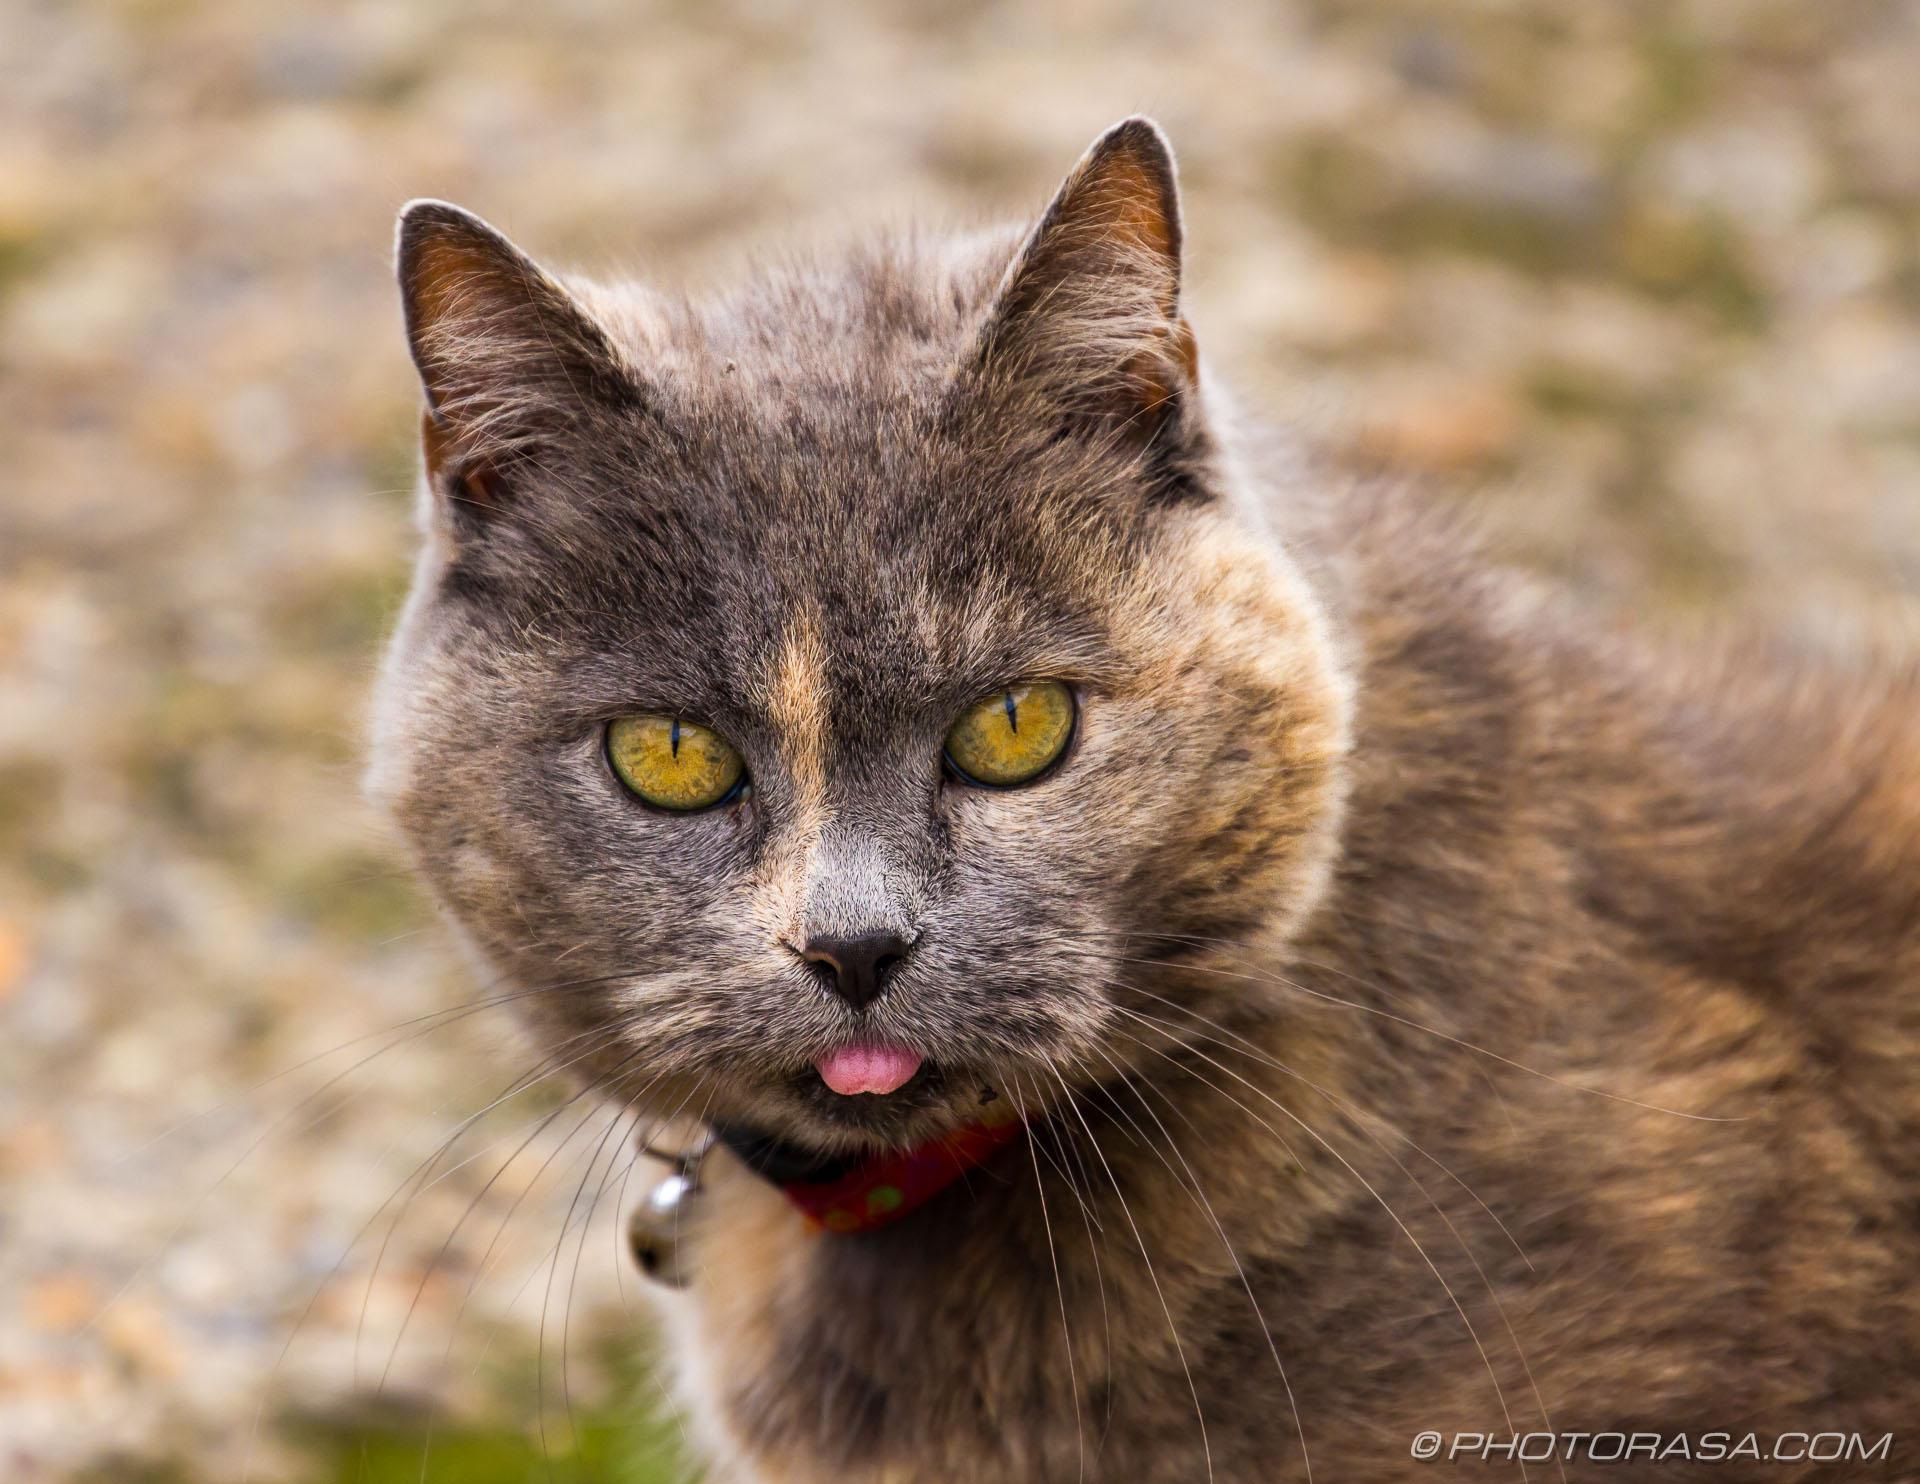 http://photorasa.com/grey-ginger-moggy/grey-ginger-cat/